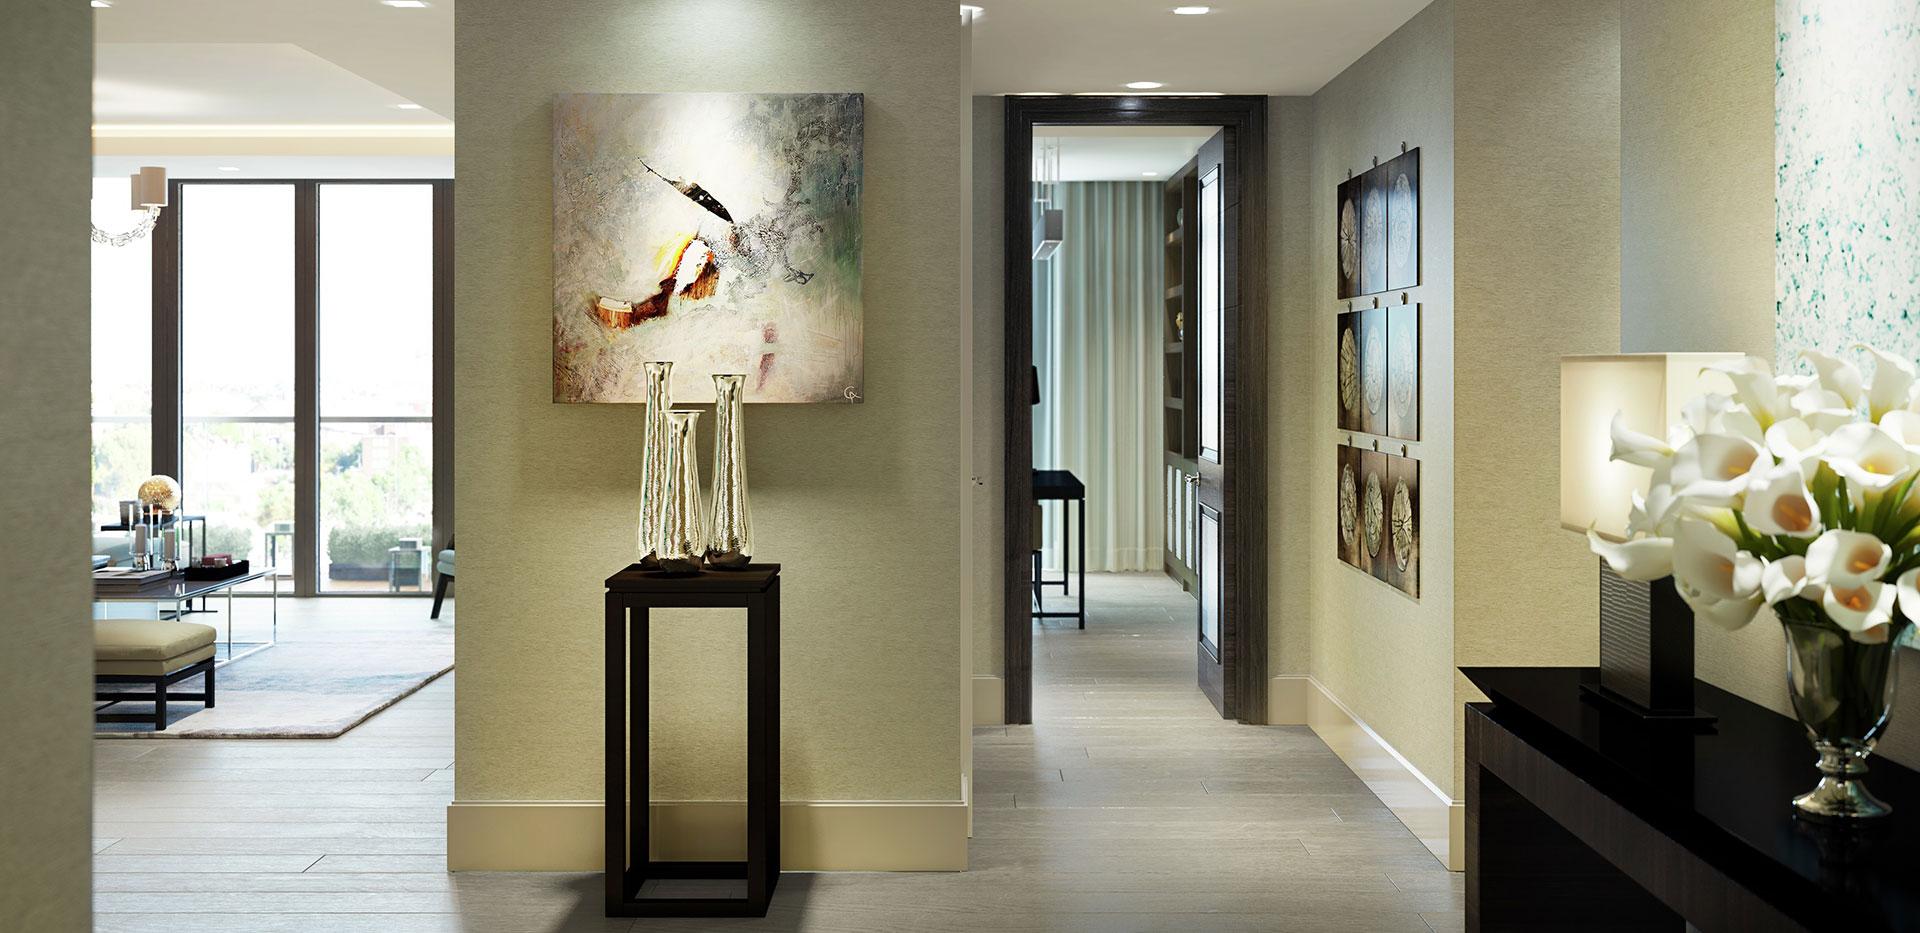 St Edwards, Kensington Row, Mowbray House, Living Room Options CGI